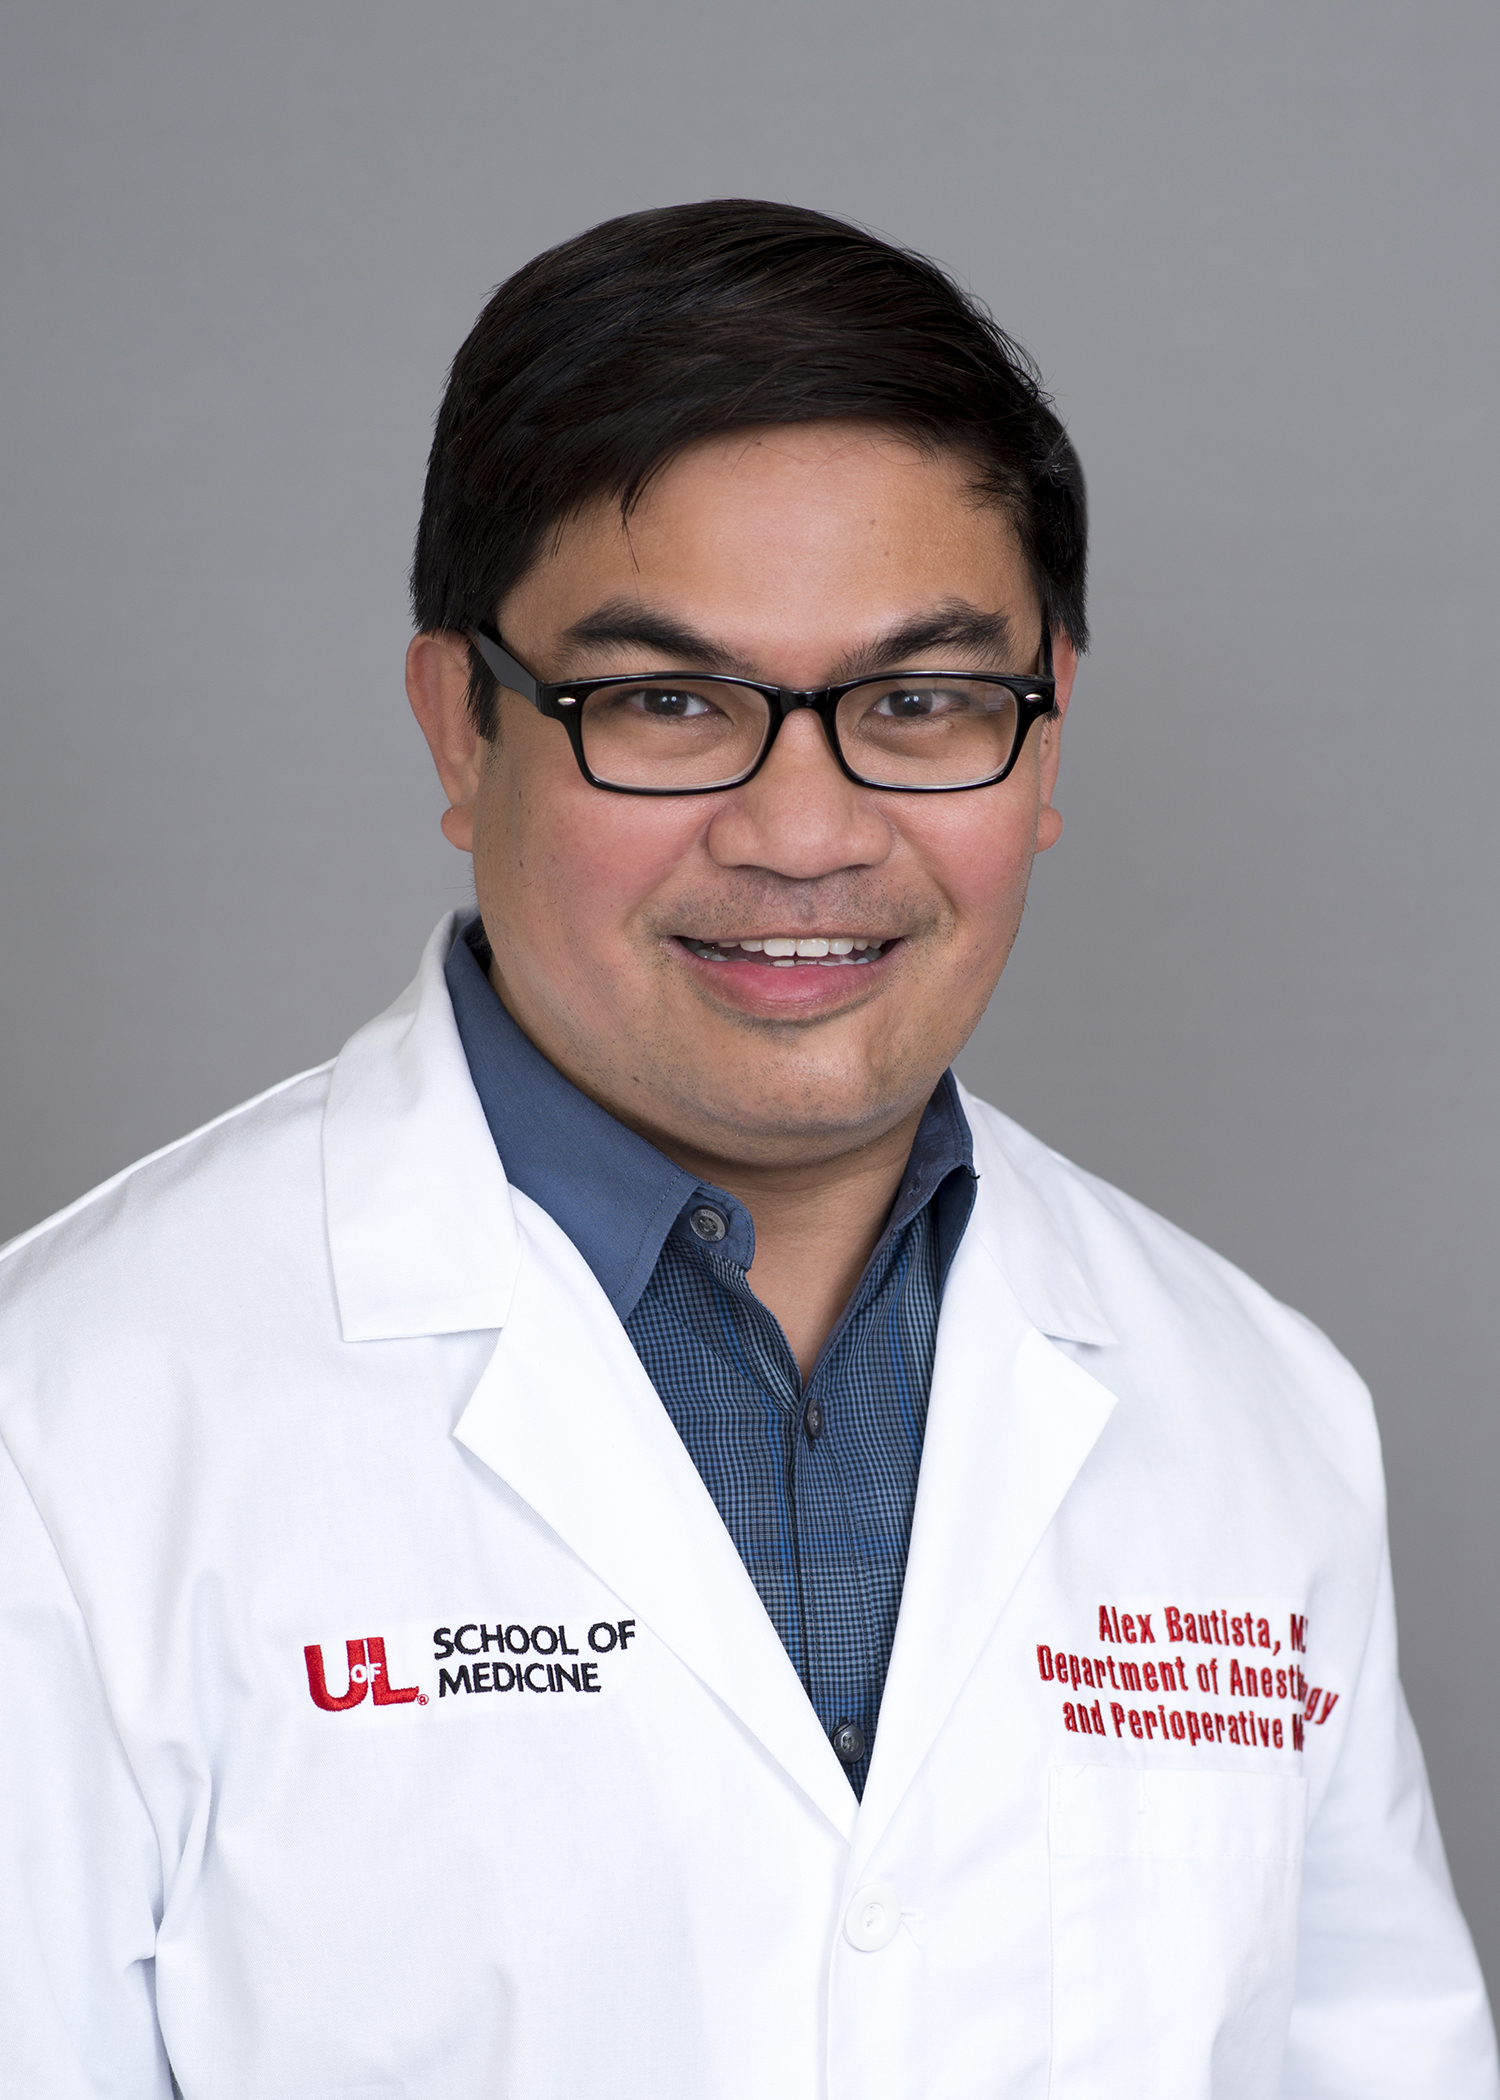 Dr. Alex Bautista